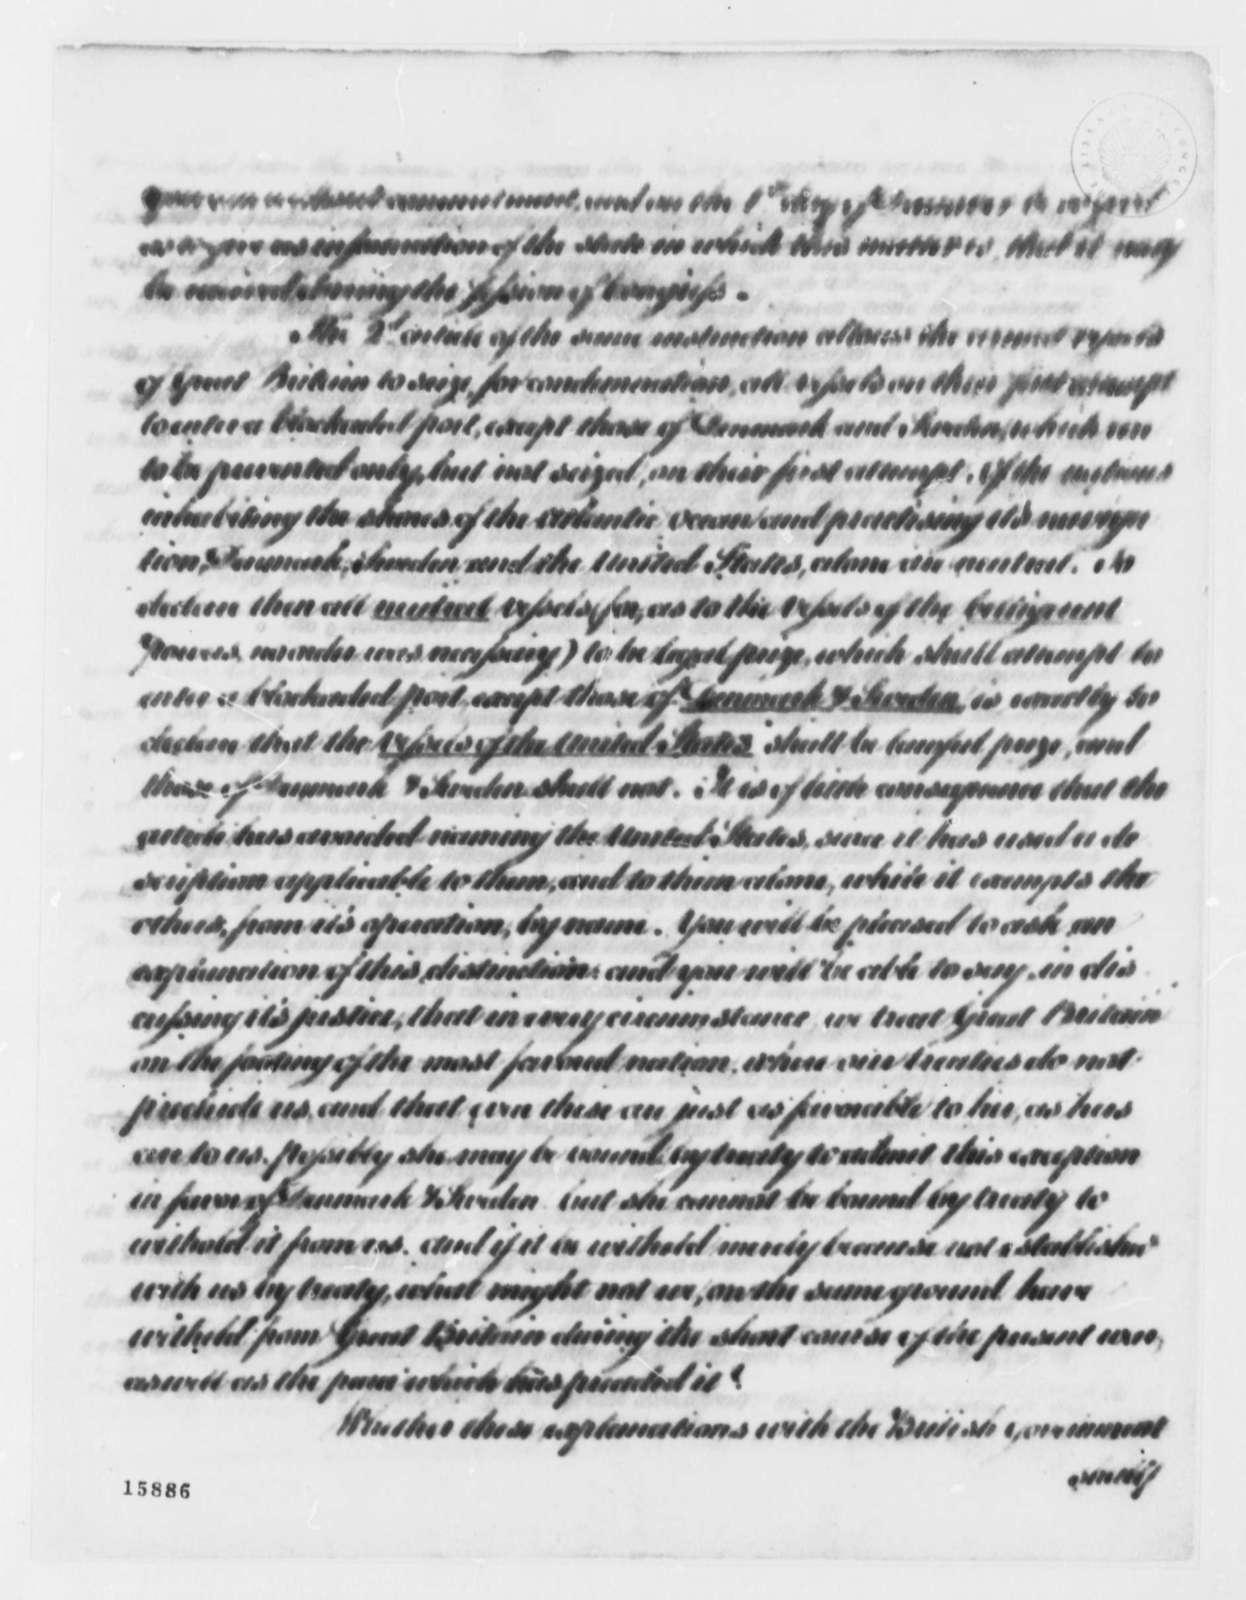 Thomas Jefferson to Thomas Pinckney, September 7, 1793, with Copy